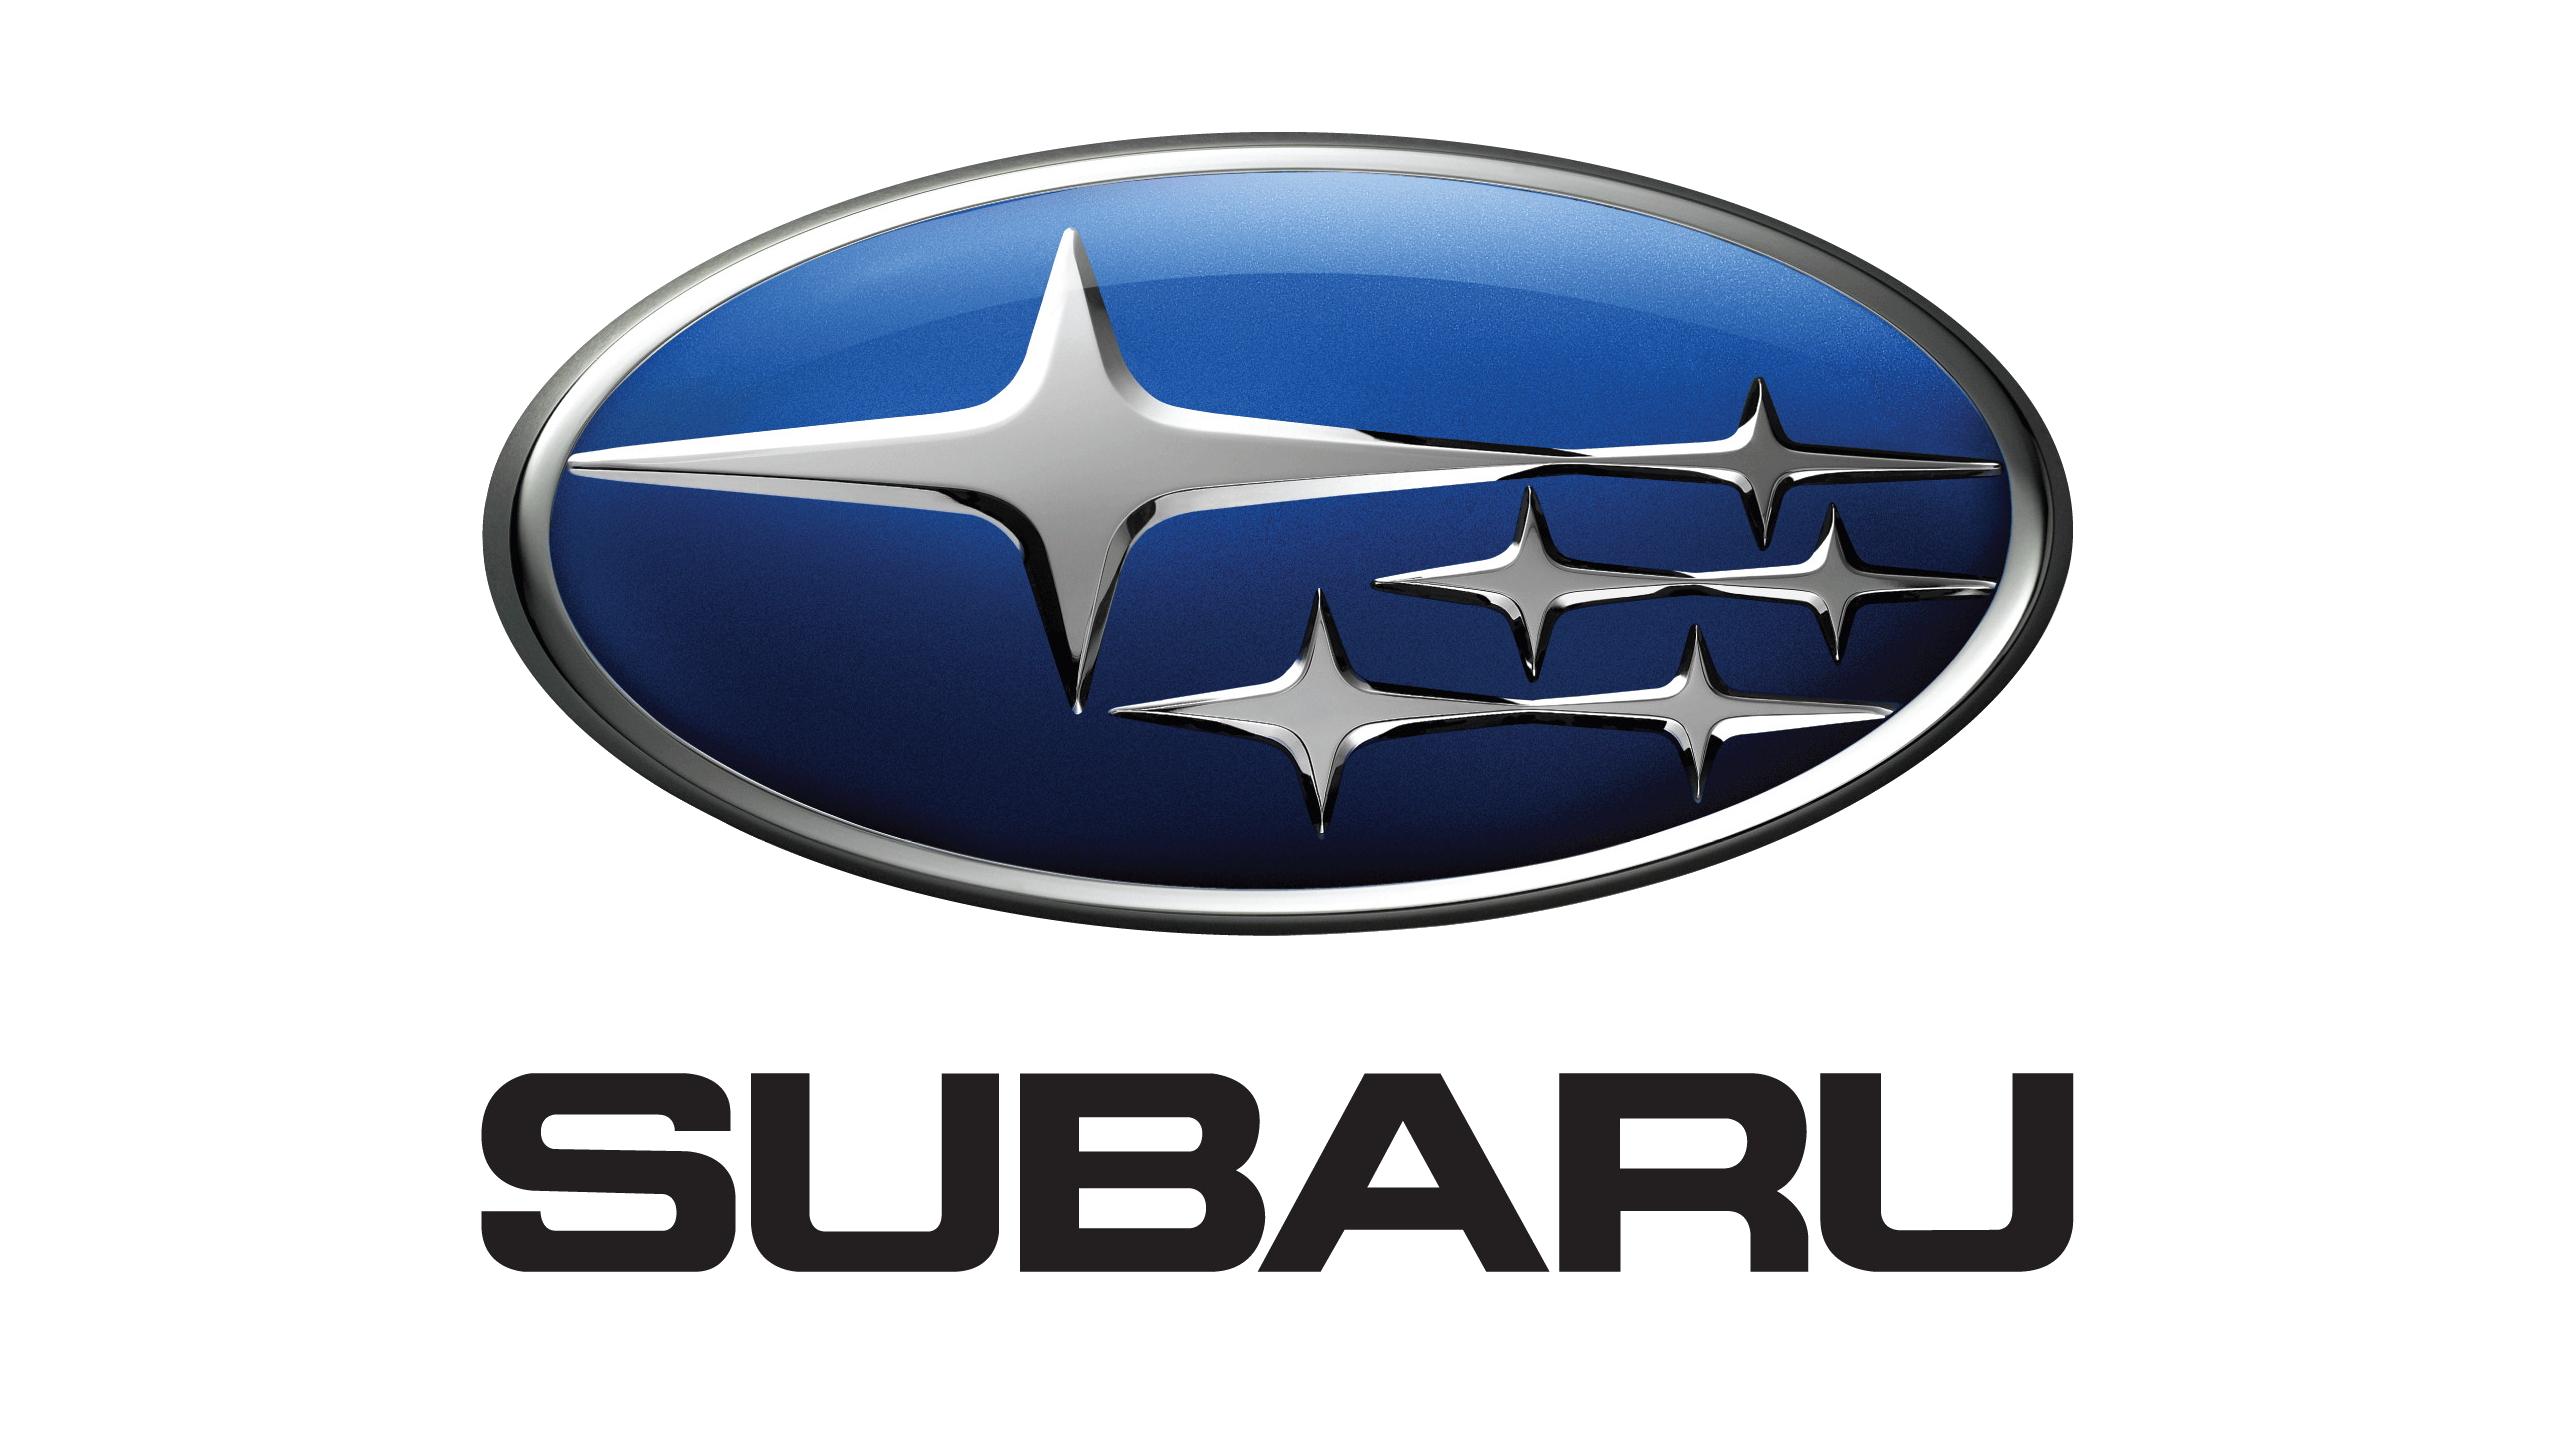 Subaru Logo, HD Png, Meaning, Information.